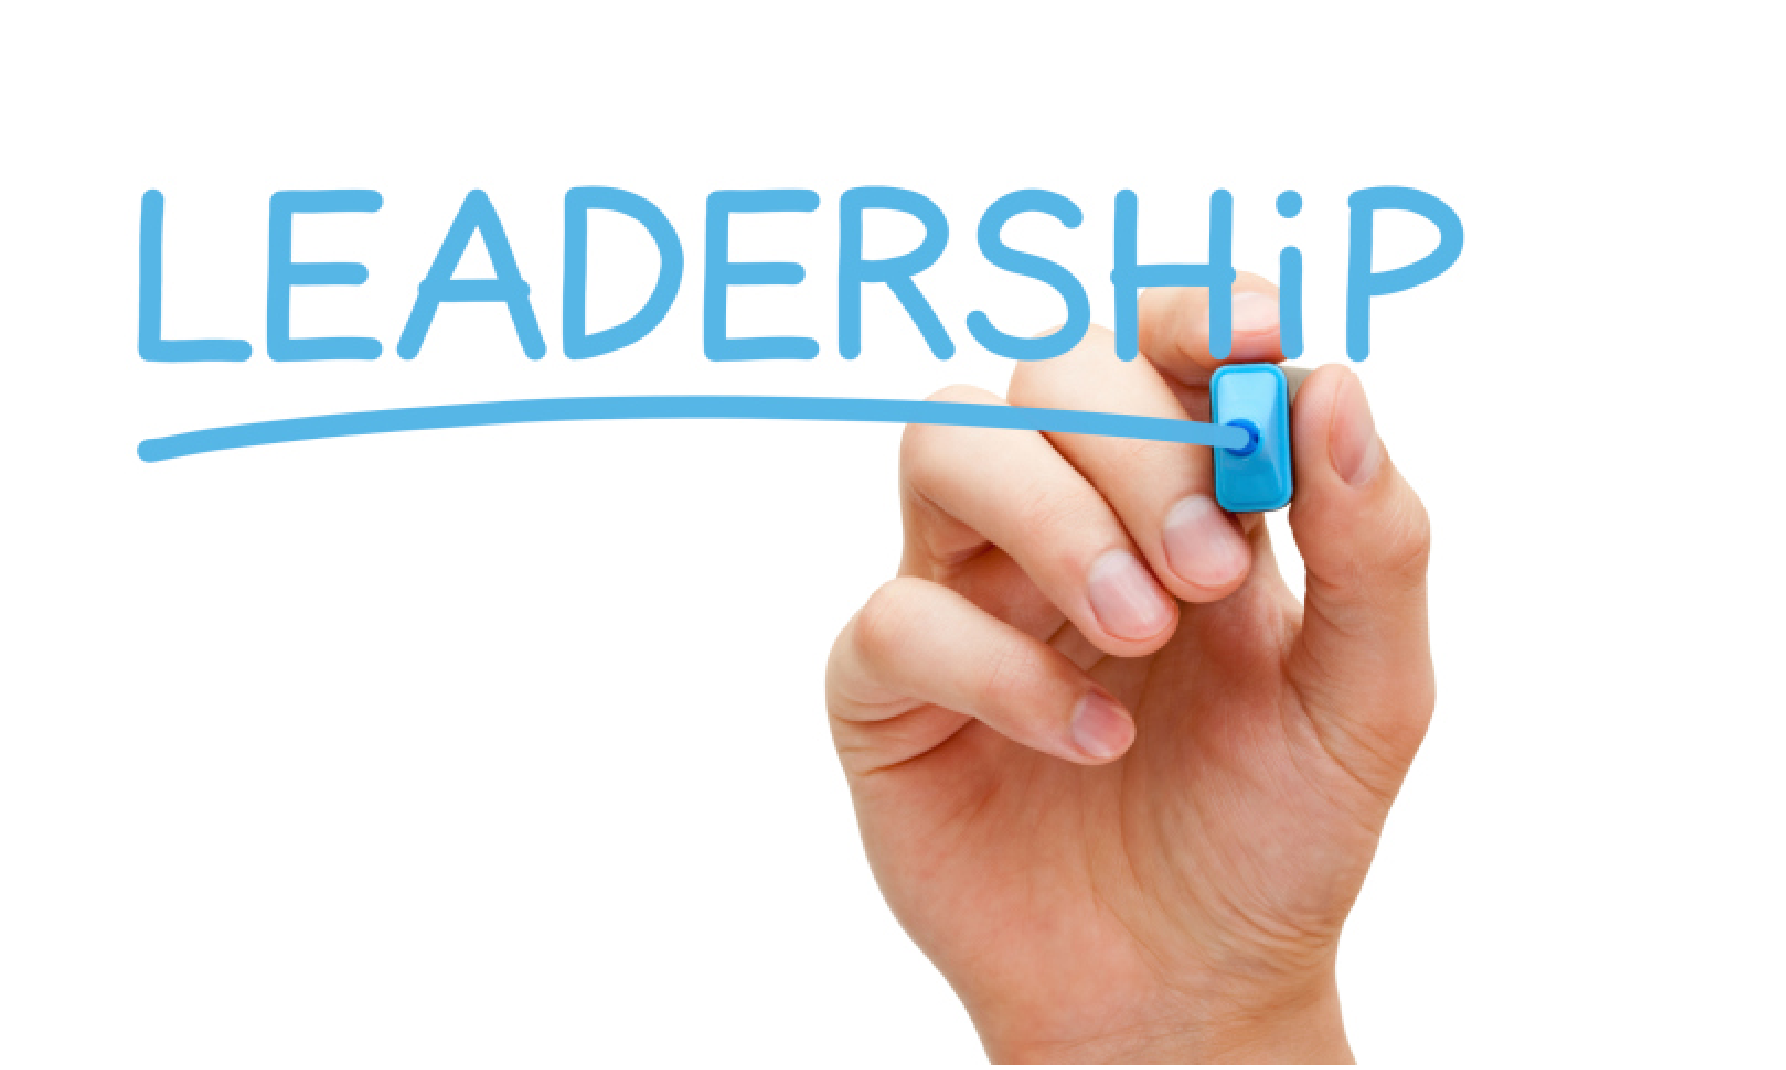 large-leadership.png